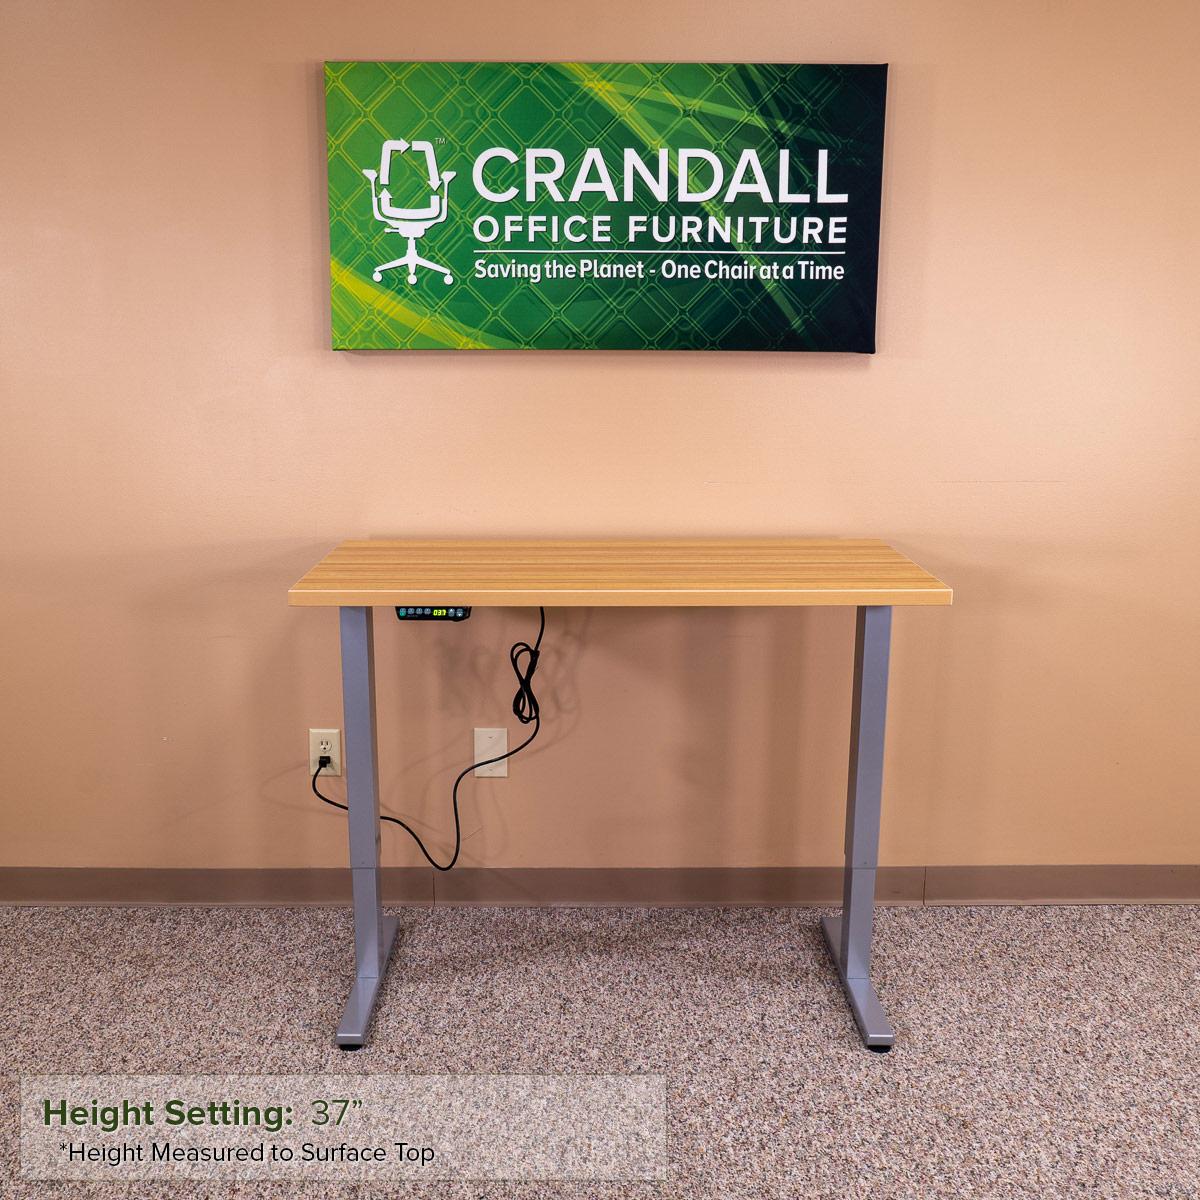 Crandall-Office-Furniture-ErgomatIQ Height-Adjustable-Desk-012